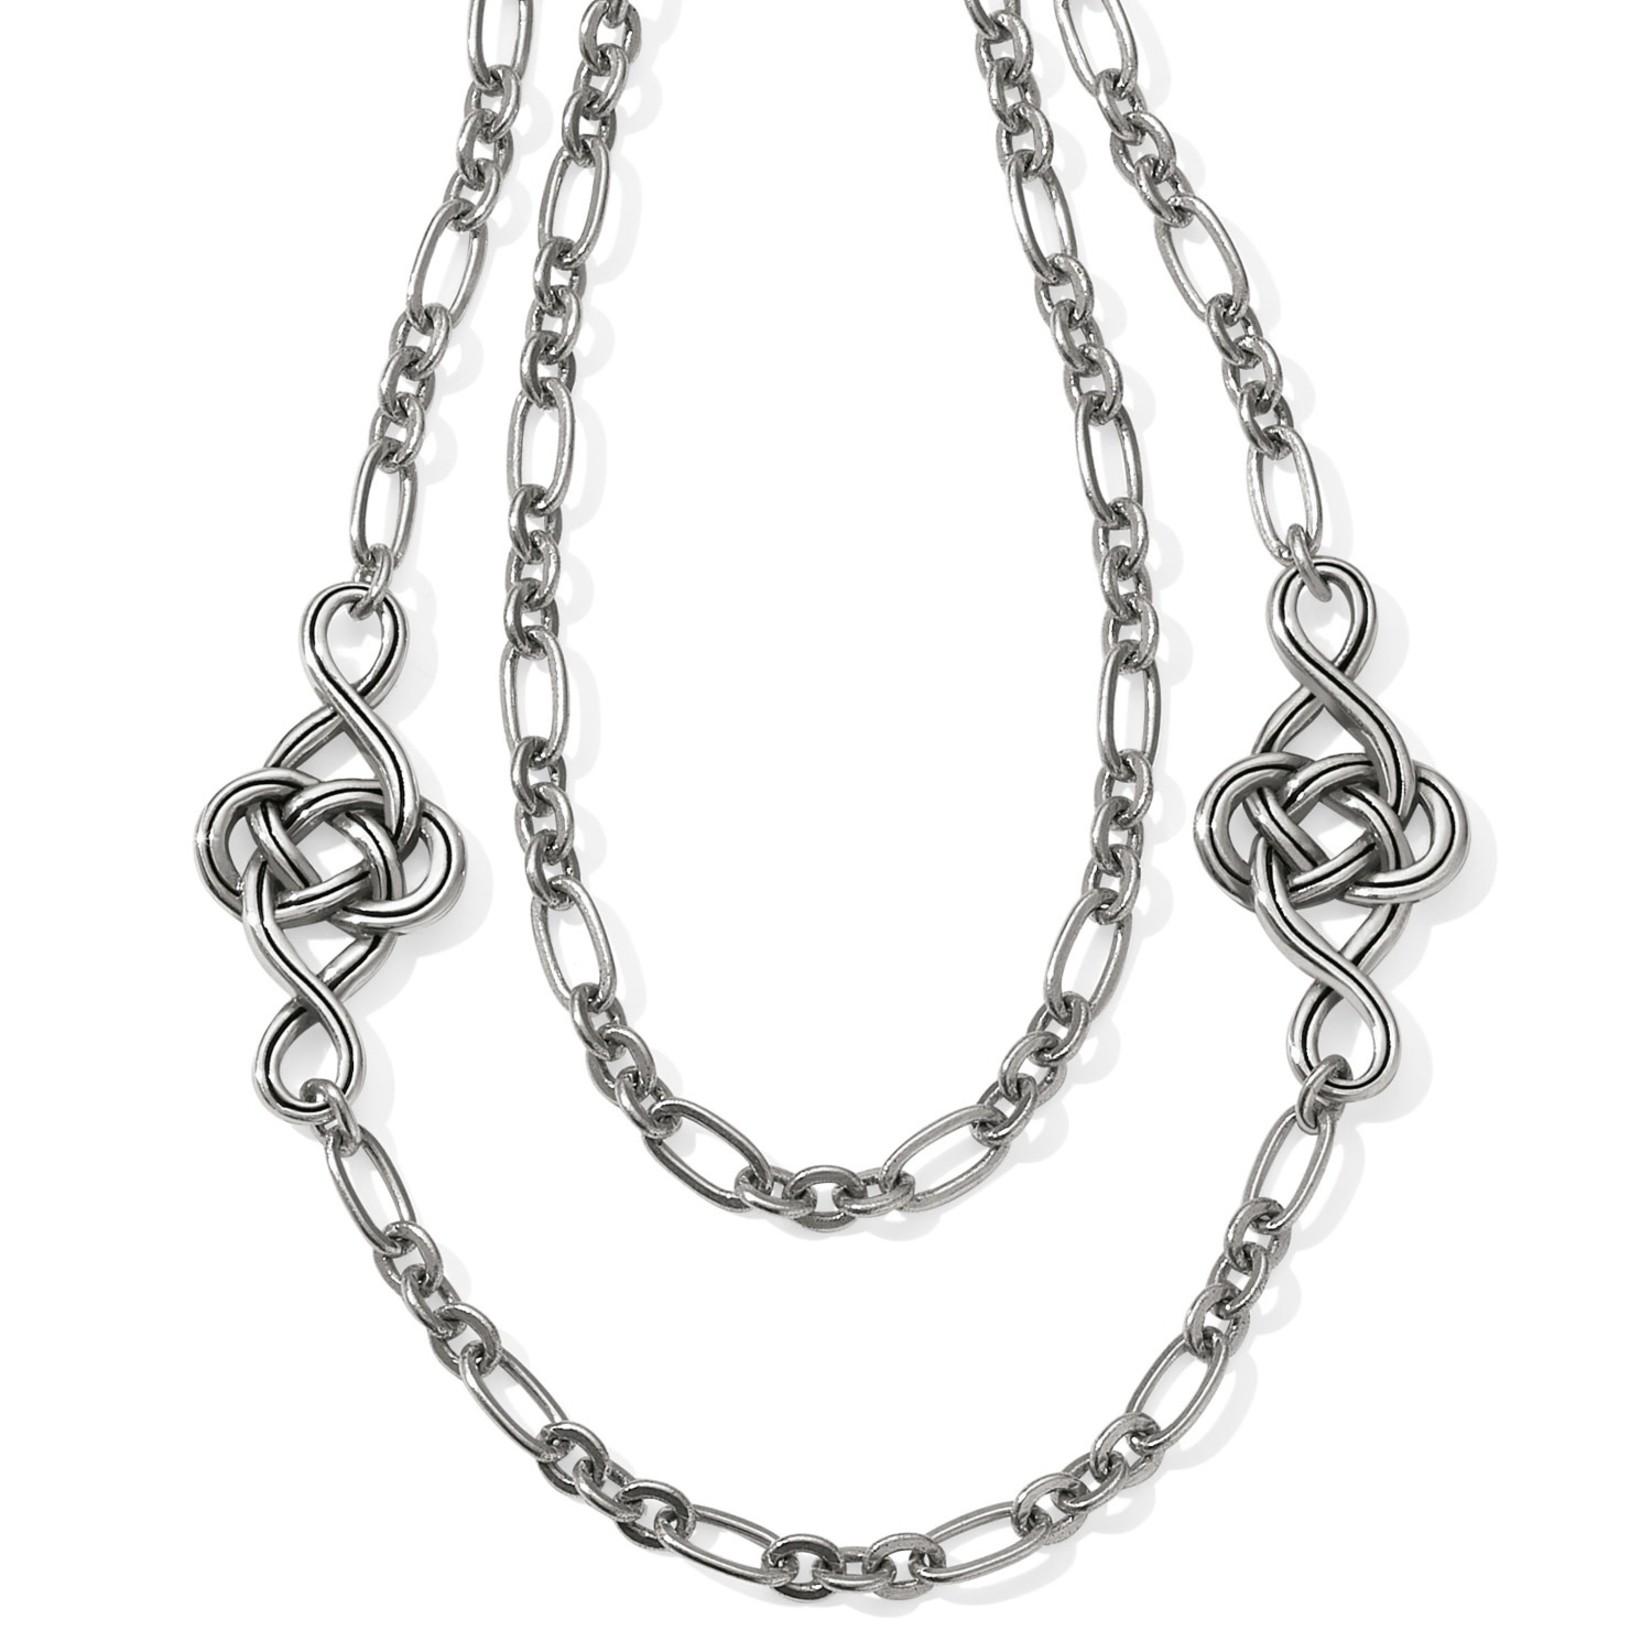 Brighton JL9540 Interlok Knot Layer Necklace